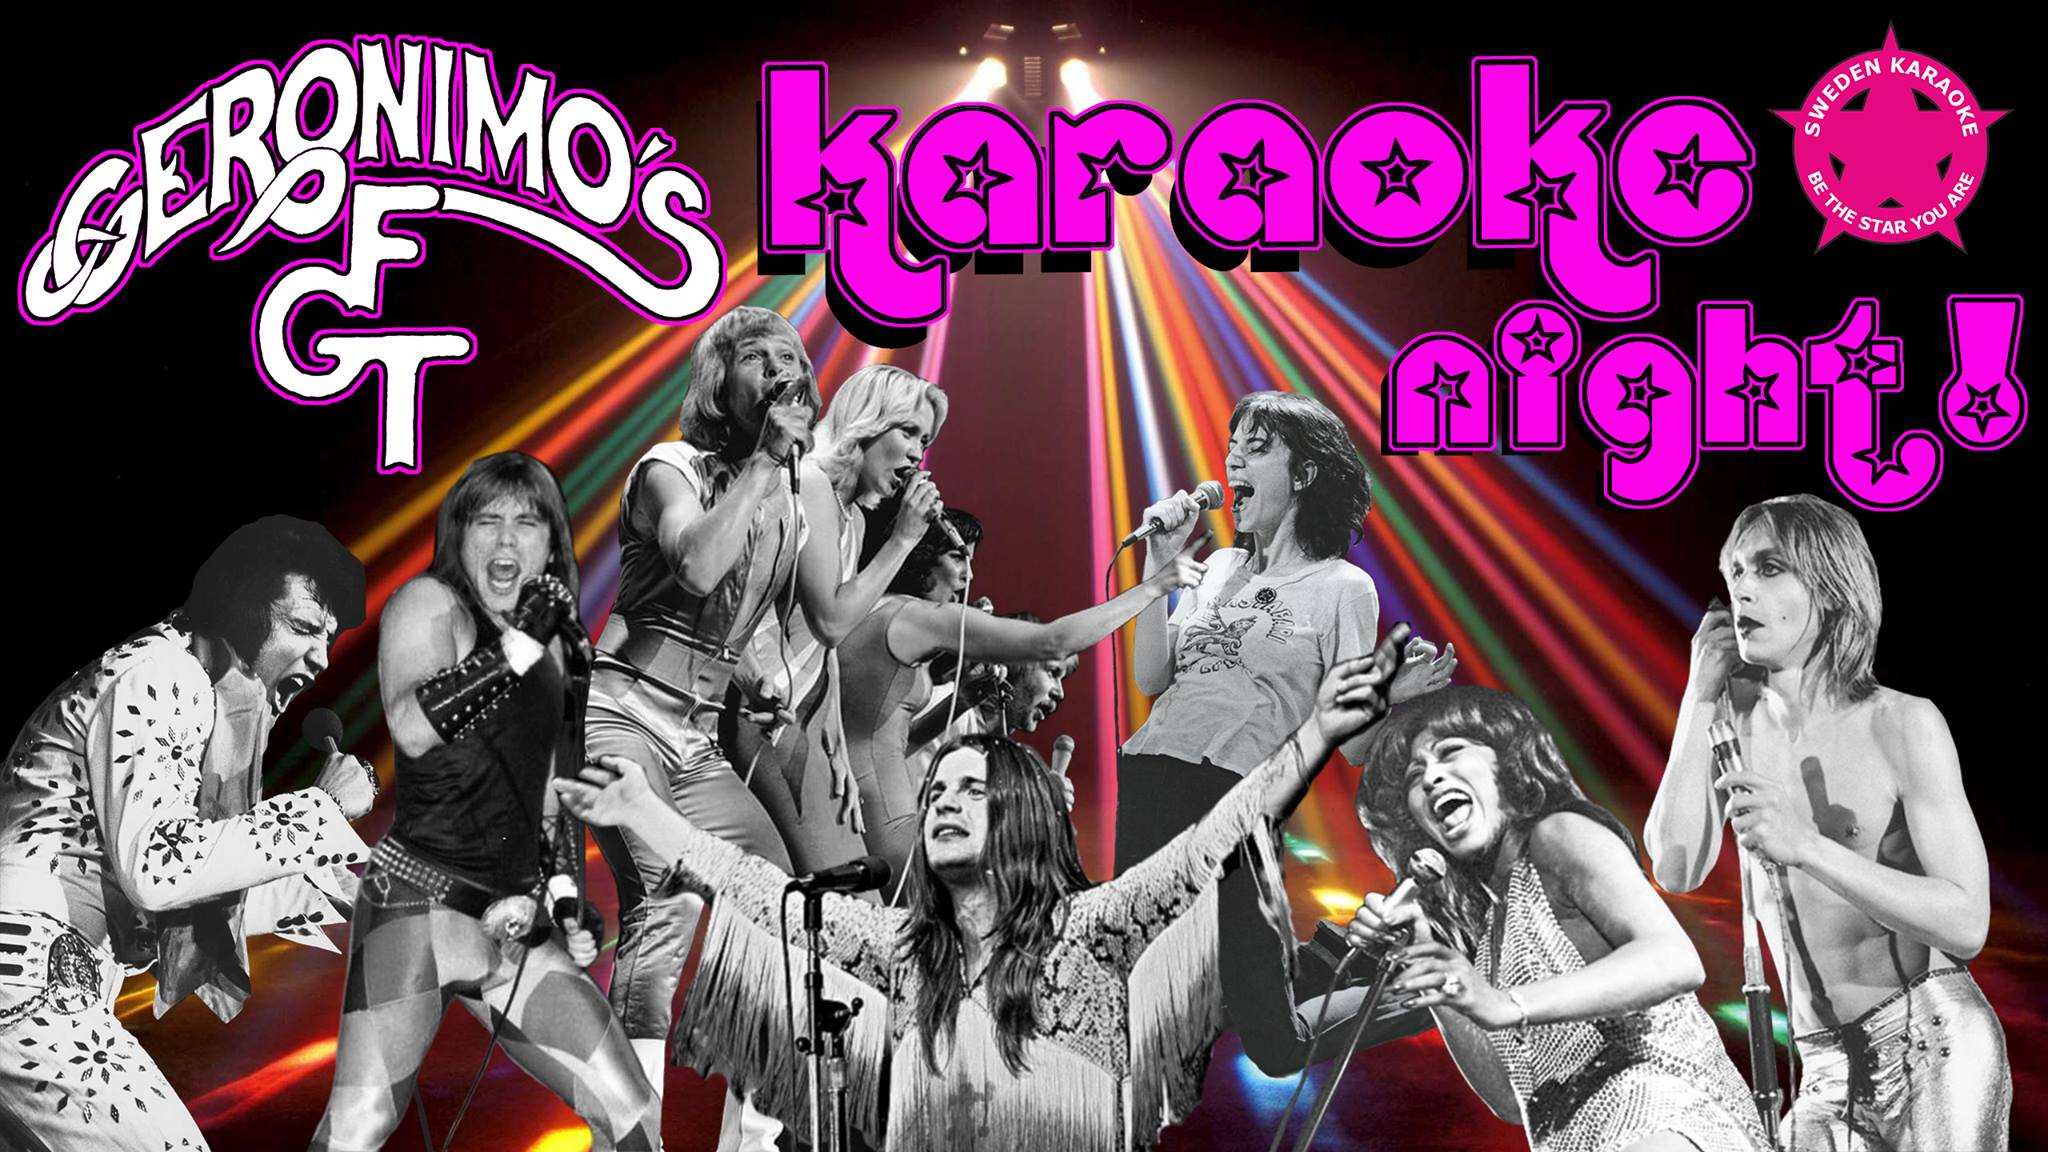 Geronimo's FGT Karaoke Night